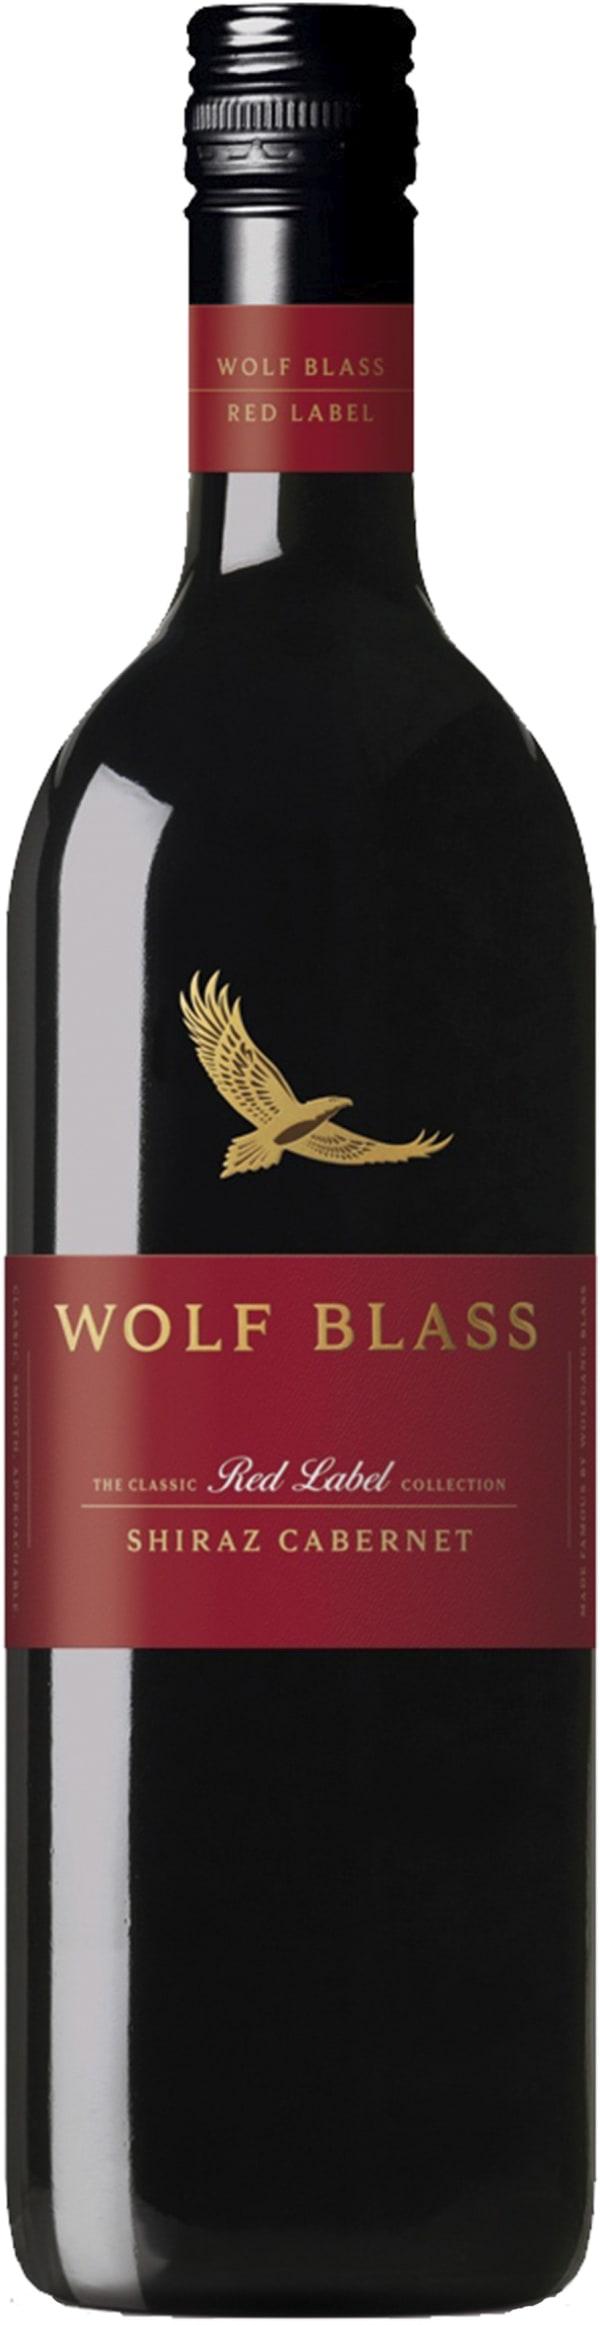 Wolf Blass Red Label Shiraz Cabernet  2019